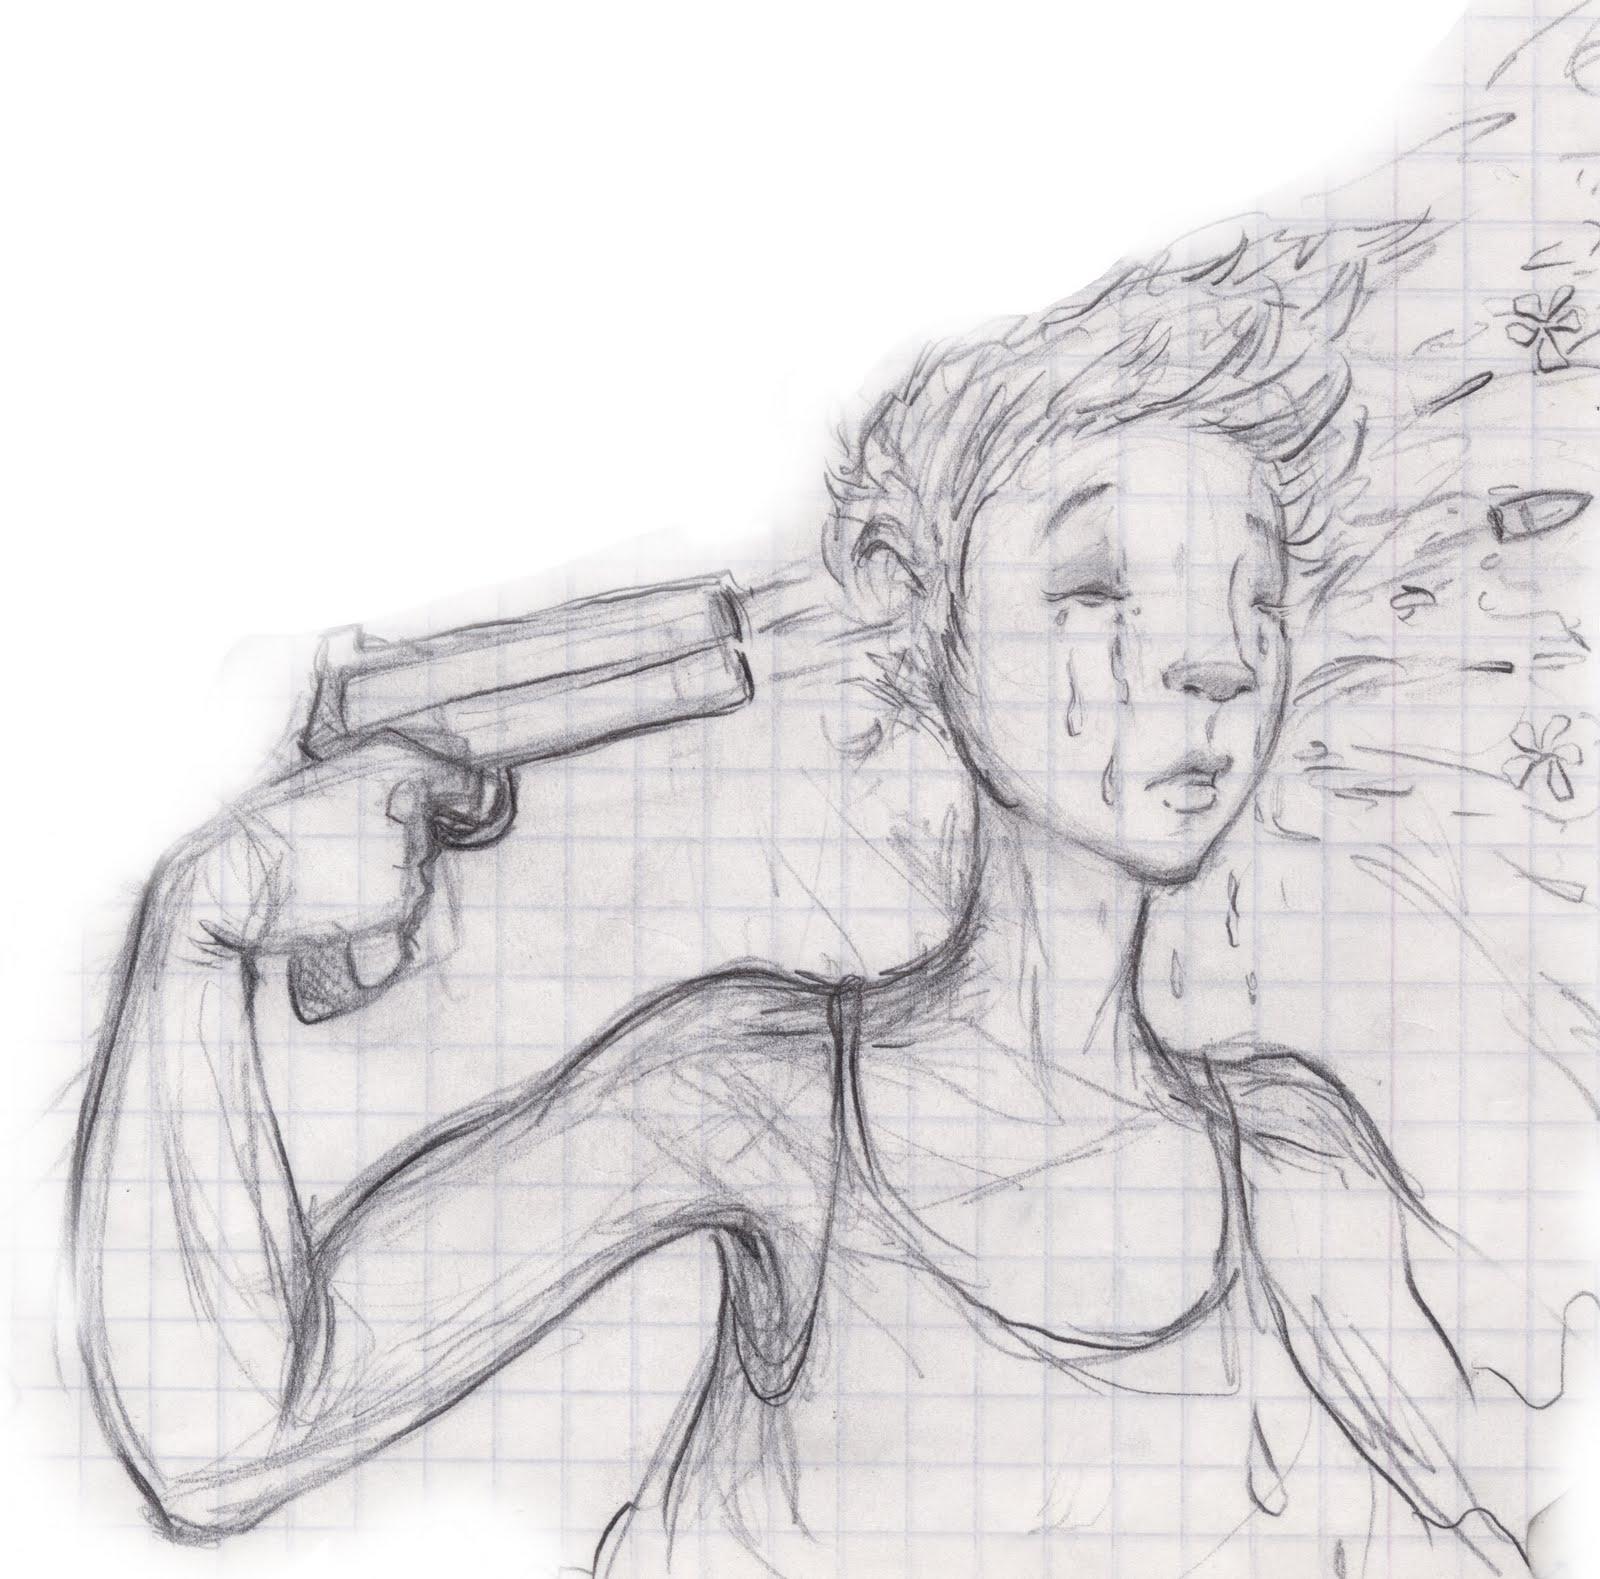 Drawn pistol gun shooting Tattoo girl head girl design